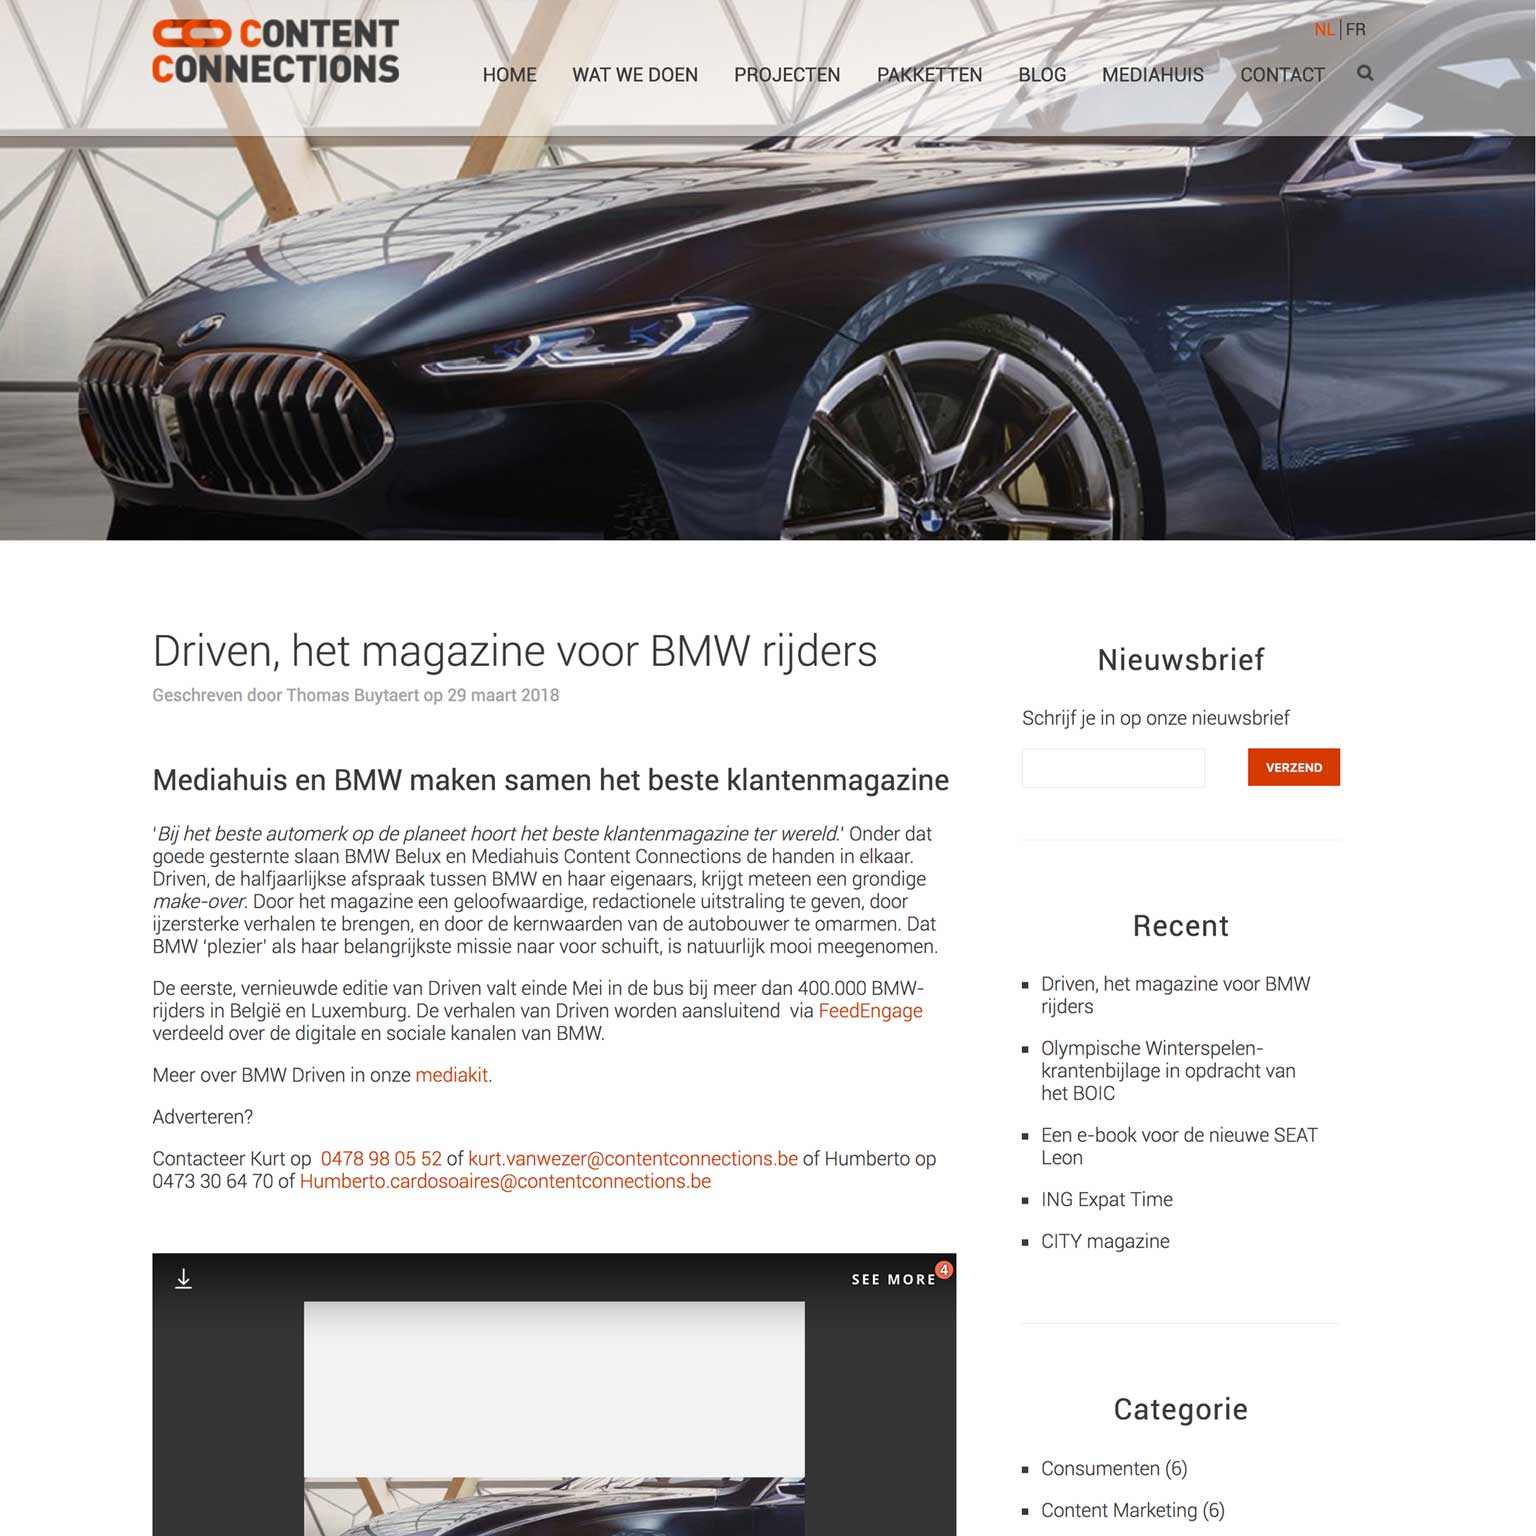 1536x1536-case-study-contentconnections-webpage